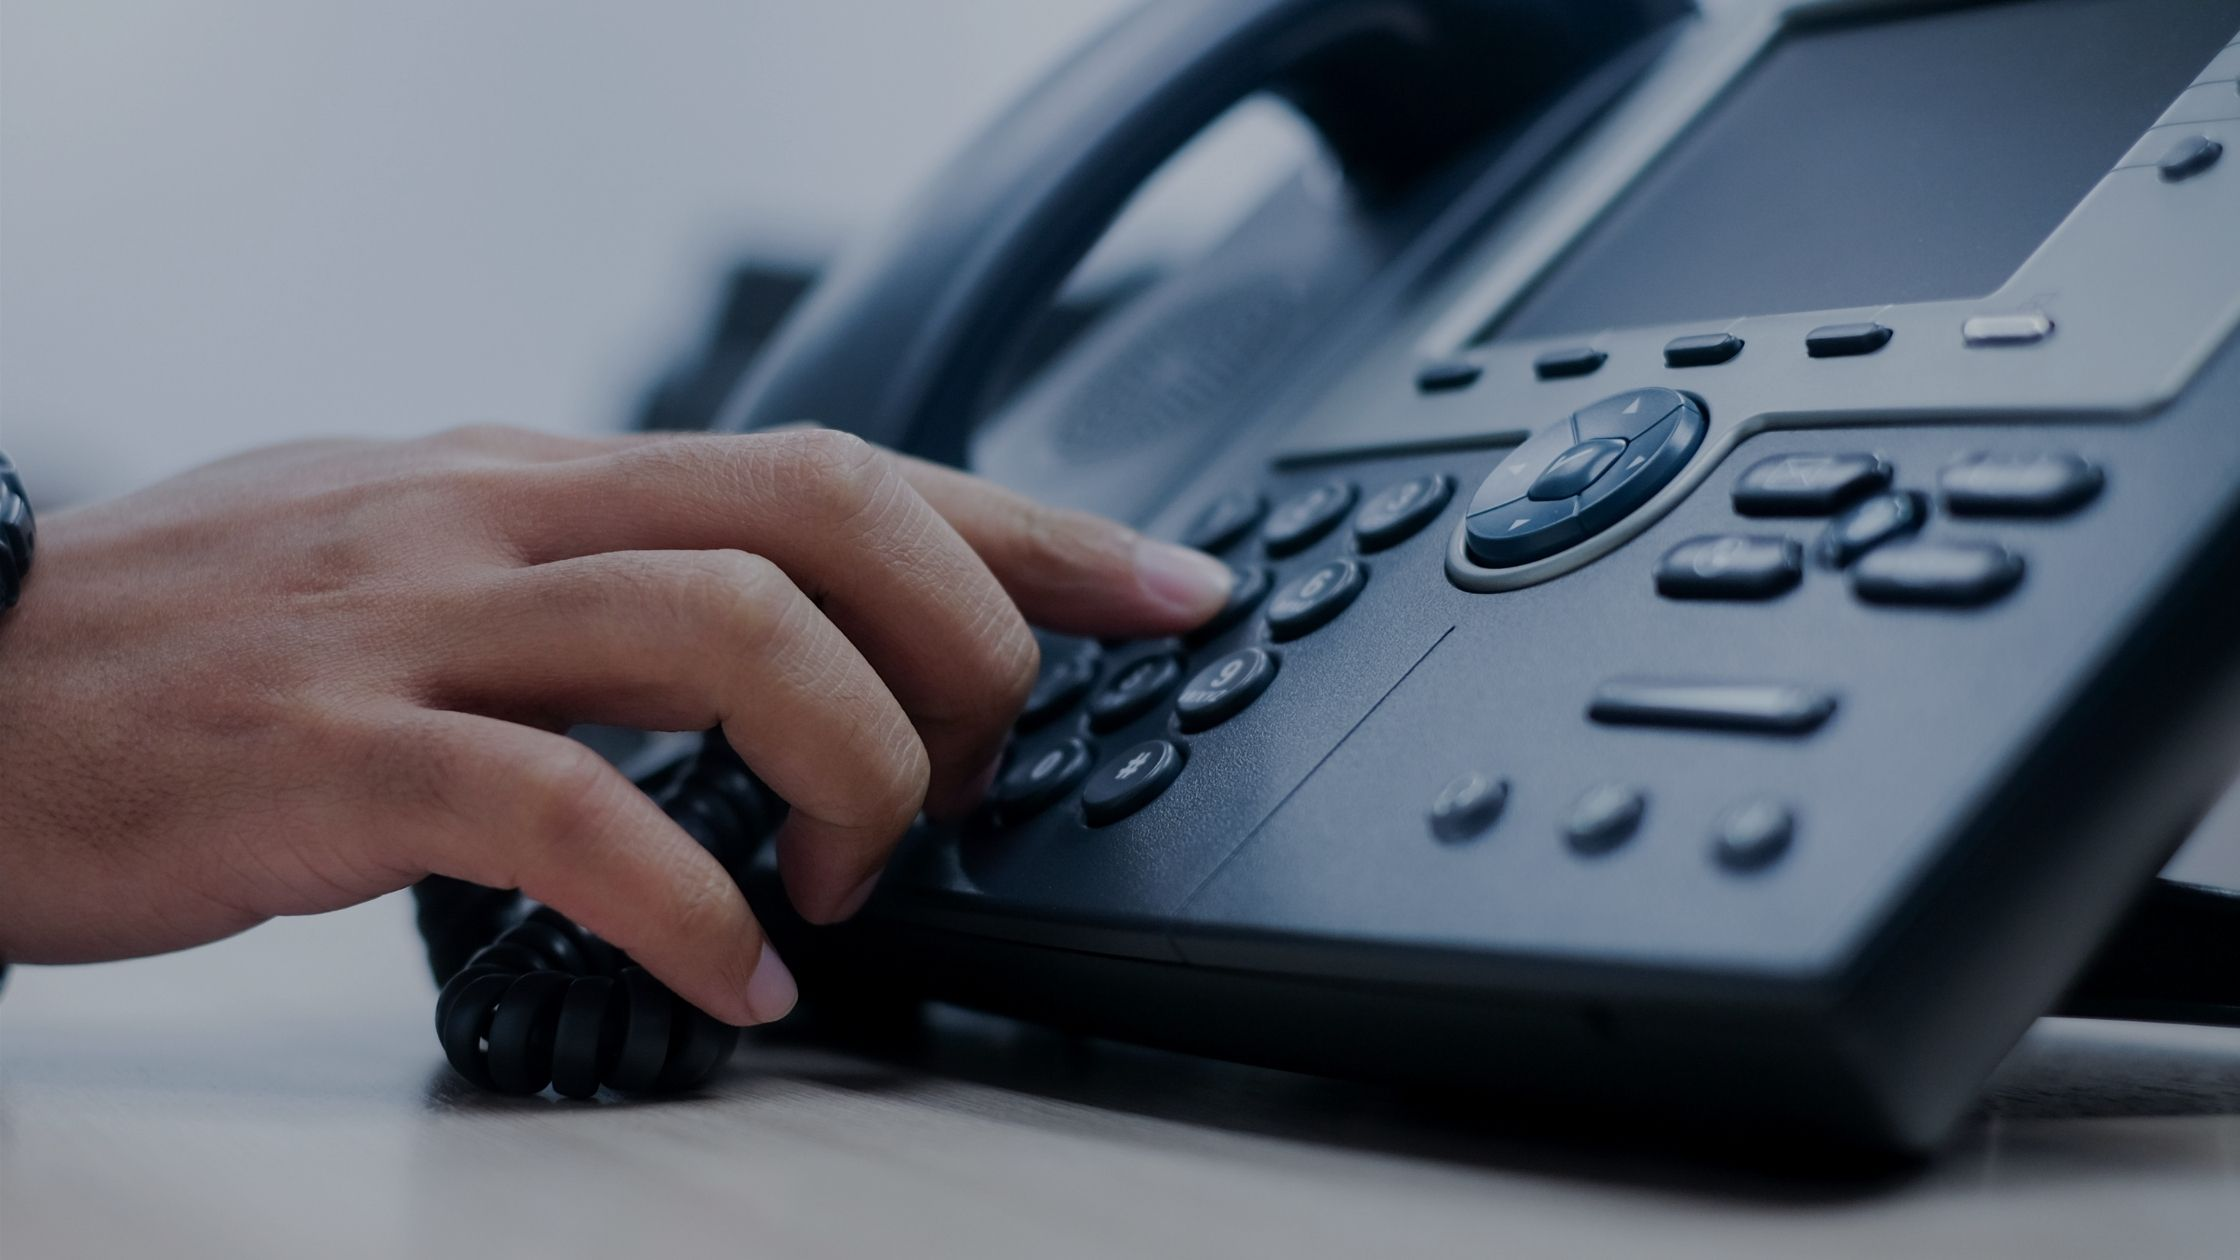 Filtrez vos appels entrants avec un serveur vocal interactif.